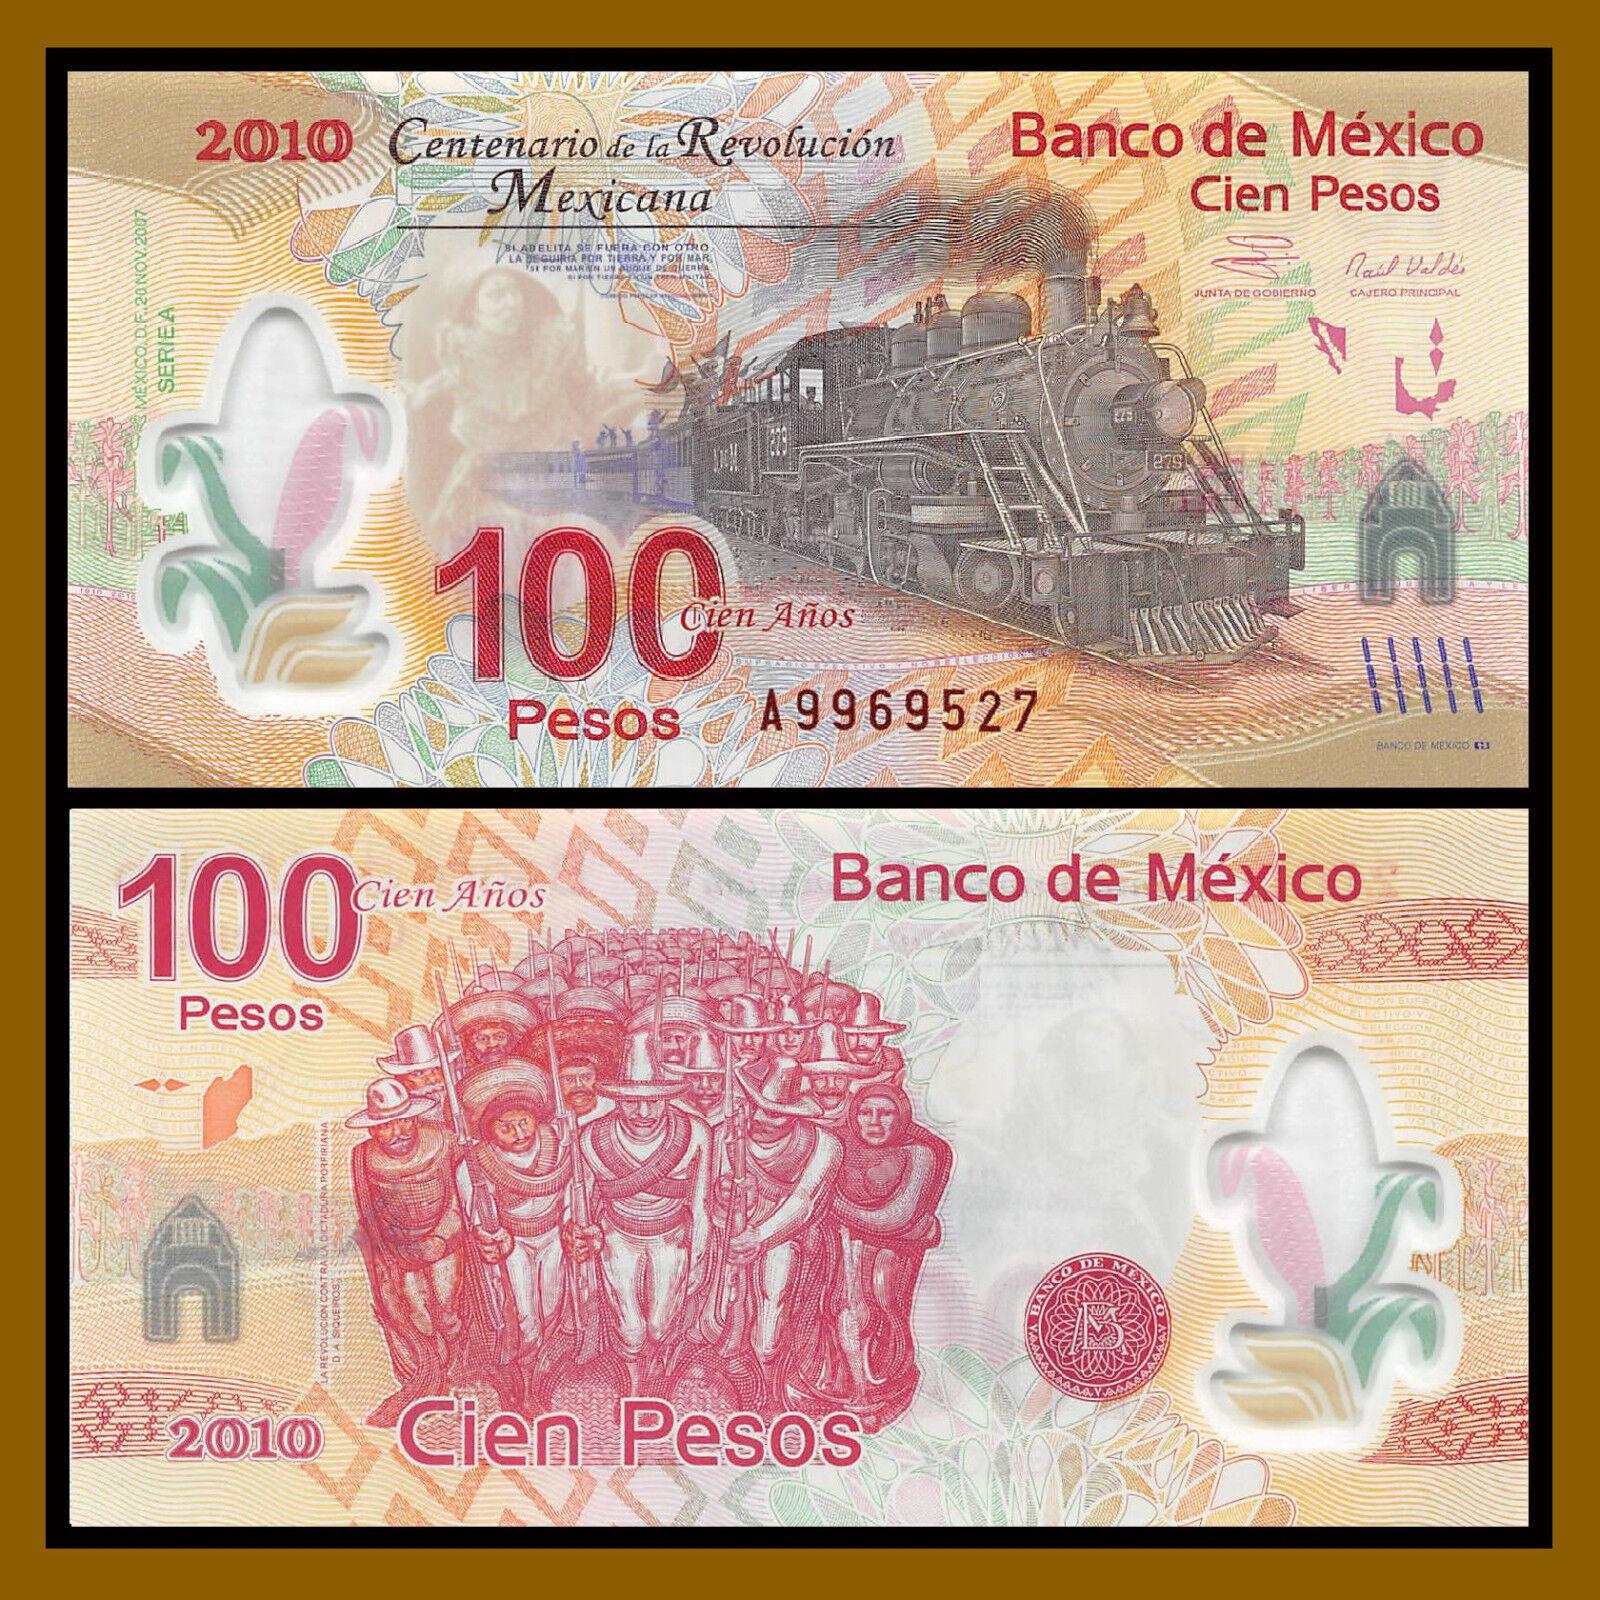 POLYMER A PREFIX SERIES UNC MEXICO 100 PESOS 2007 P 128 COMM 2010